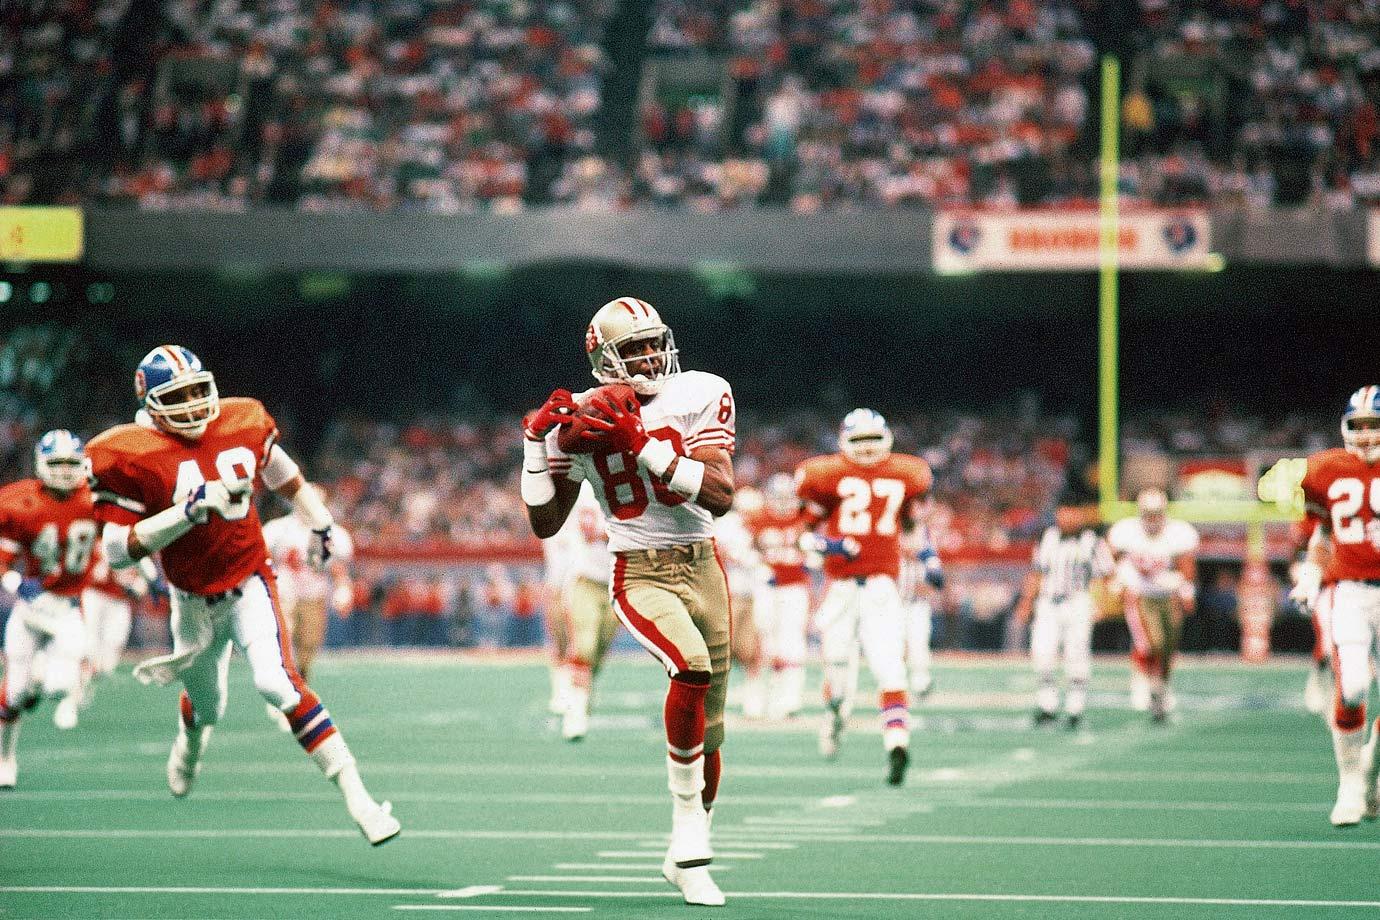 Jan. 28, 1990 — Super Bowl XXIV (San Francisco 49ers vs. Denver Broncos)